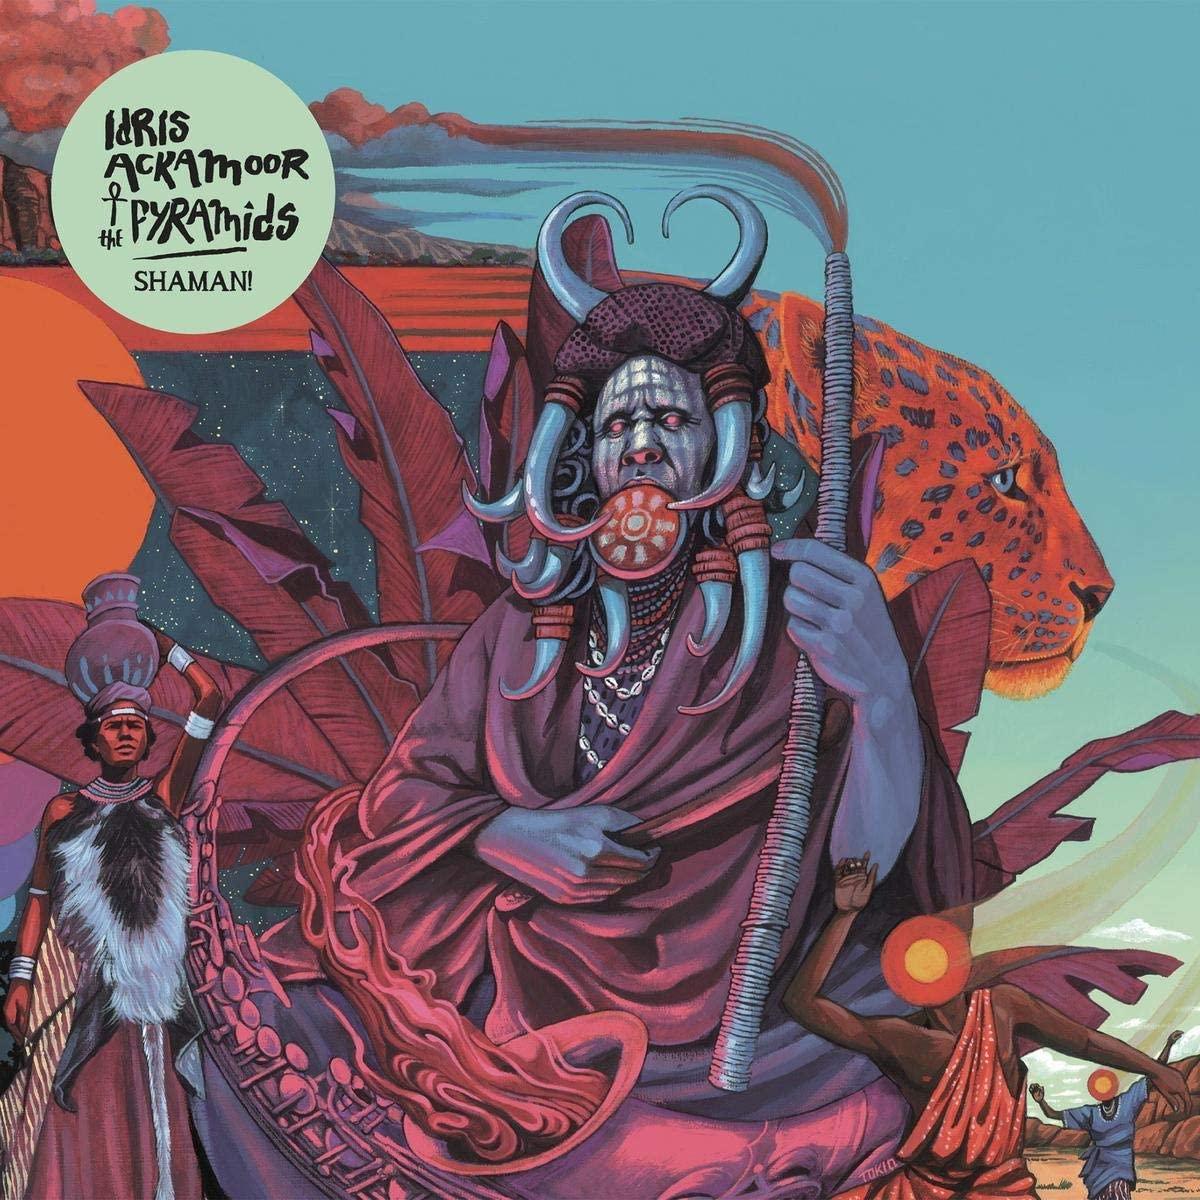 IDRIS ACKAMOOR - Idris Ackamoor & The Pyramids : Shaman! cover